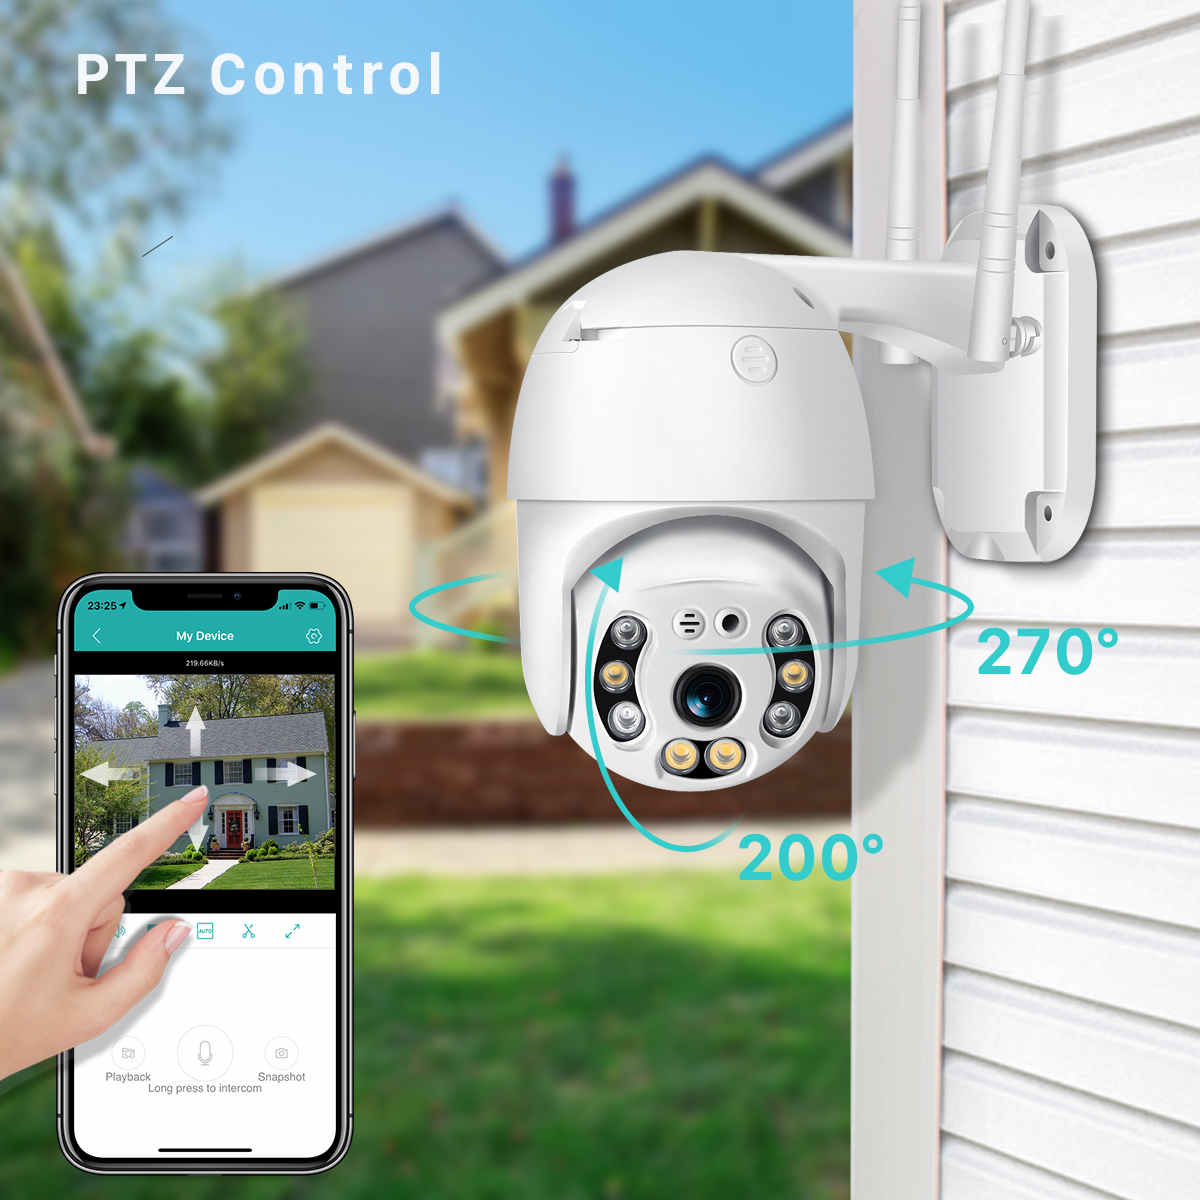 H350403885bb848948d026192abdc7b315 BESDER H.265 PTZ IP Camera 2MP WiFi Cloud Storage Motion Voice Alert Dual Antenna Dual IR Light PTZ Security Surveillance Camera